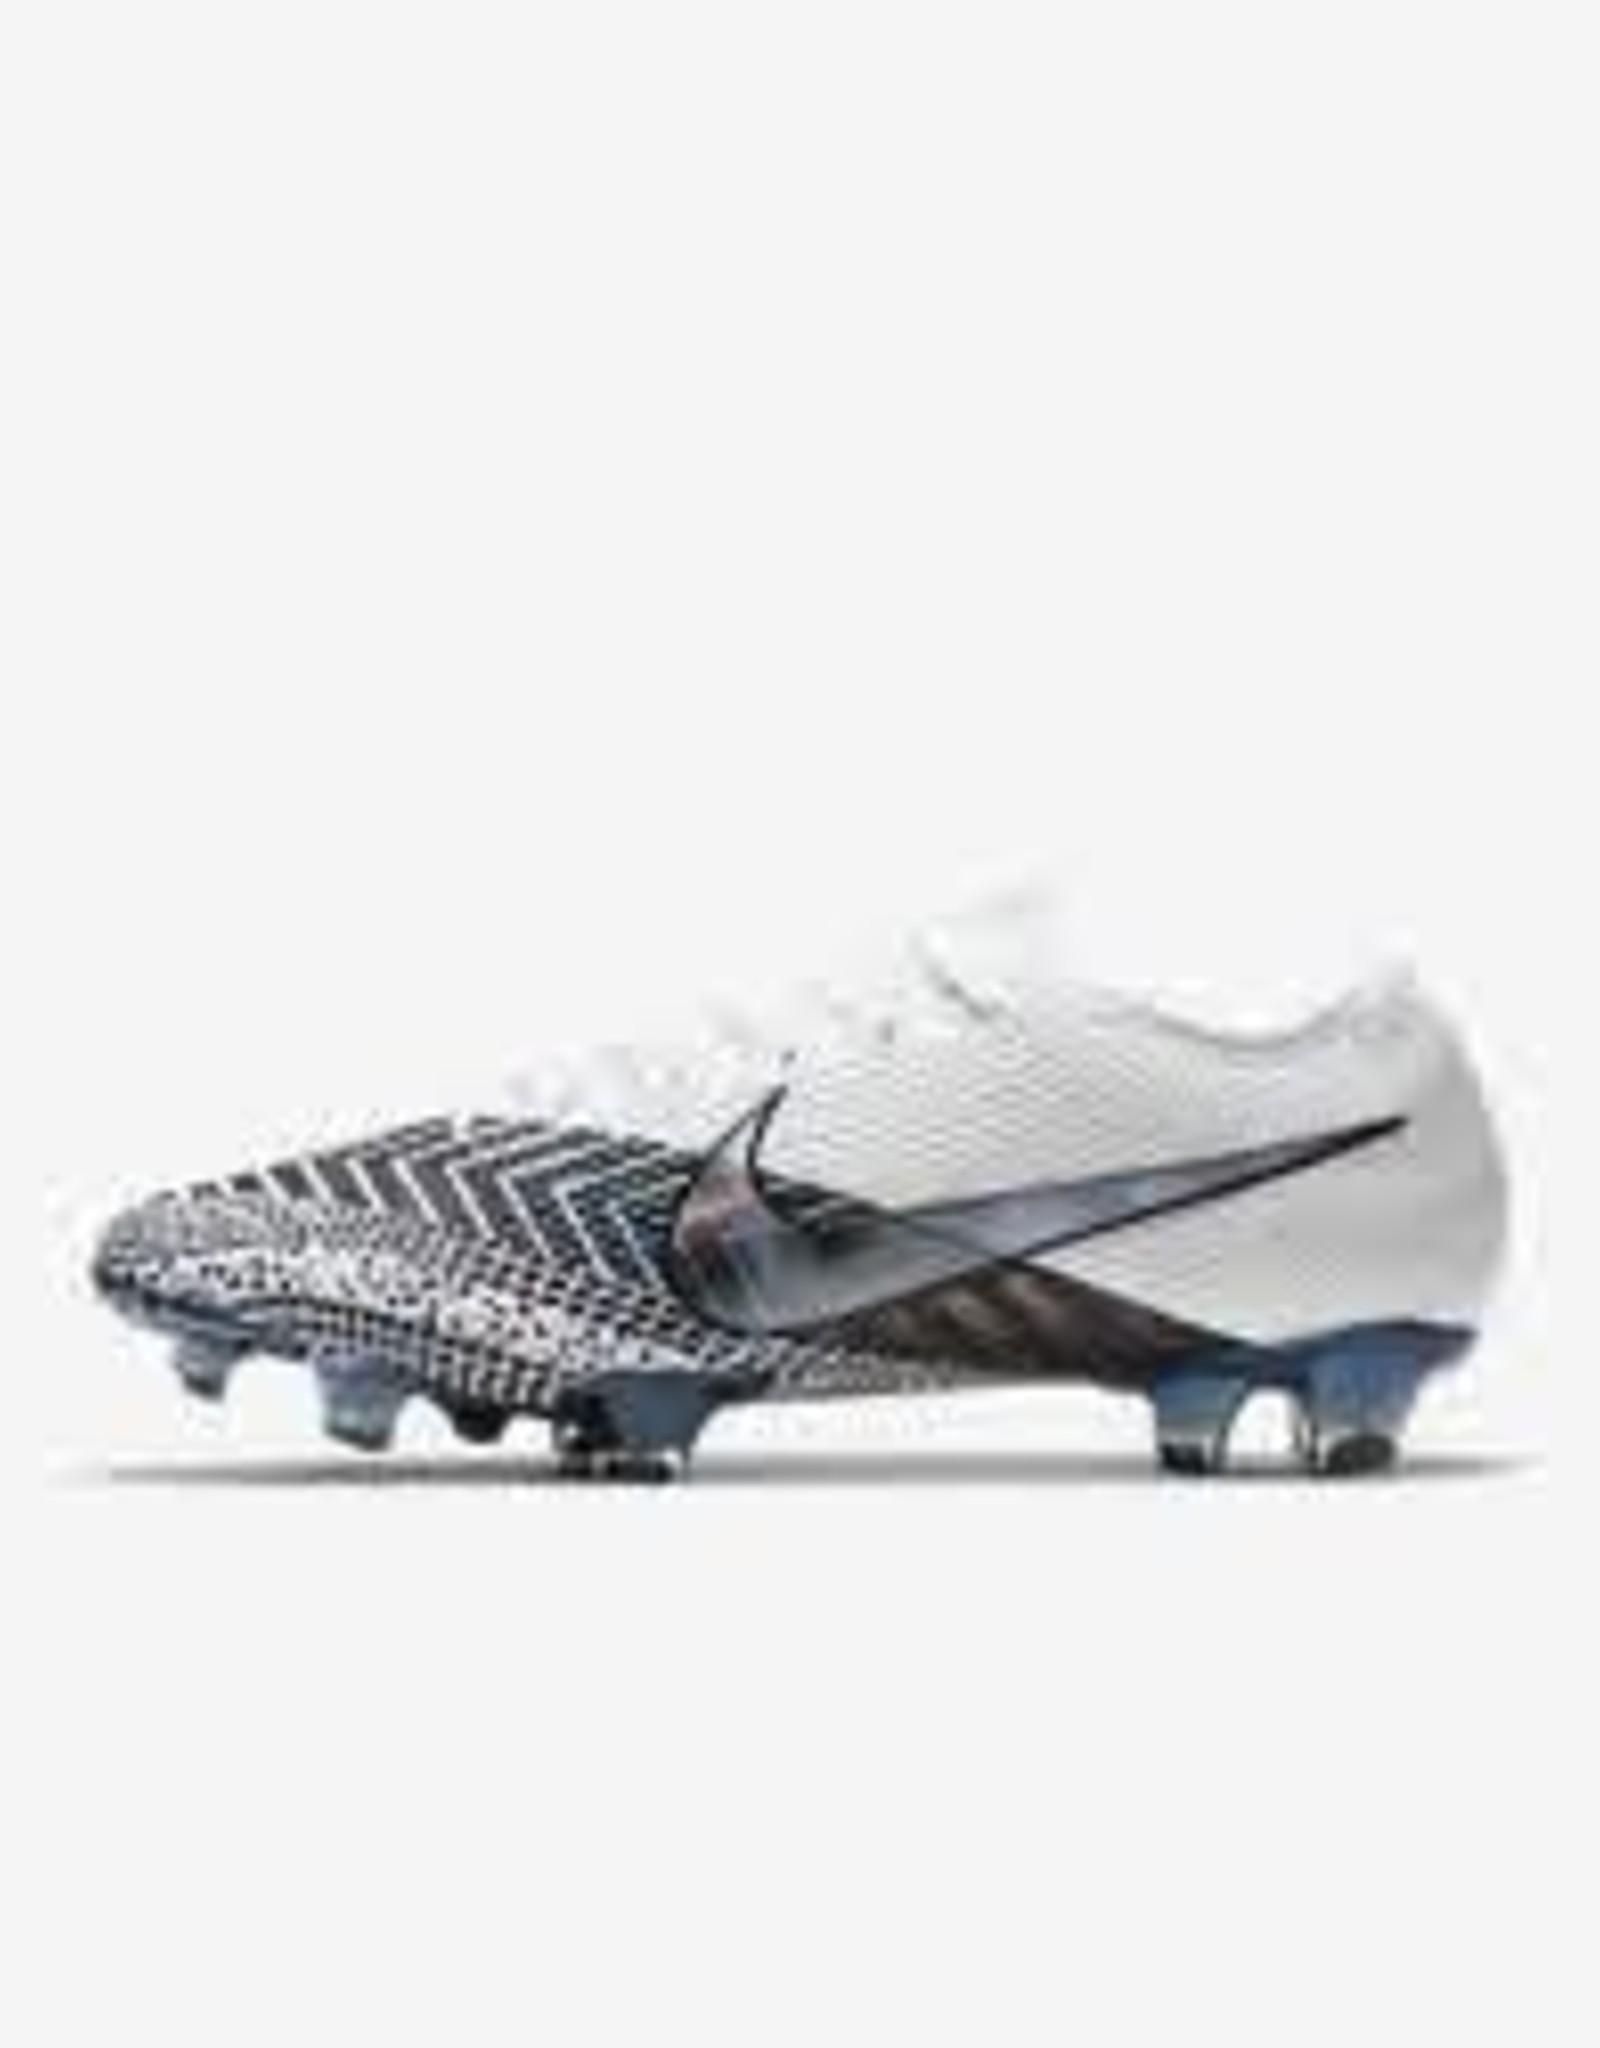 Nike Nike FG Vapor 13 Elite MDS